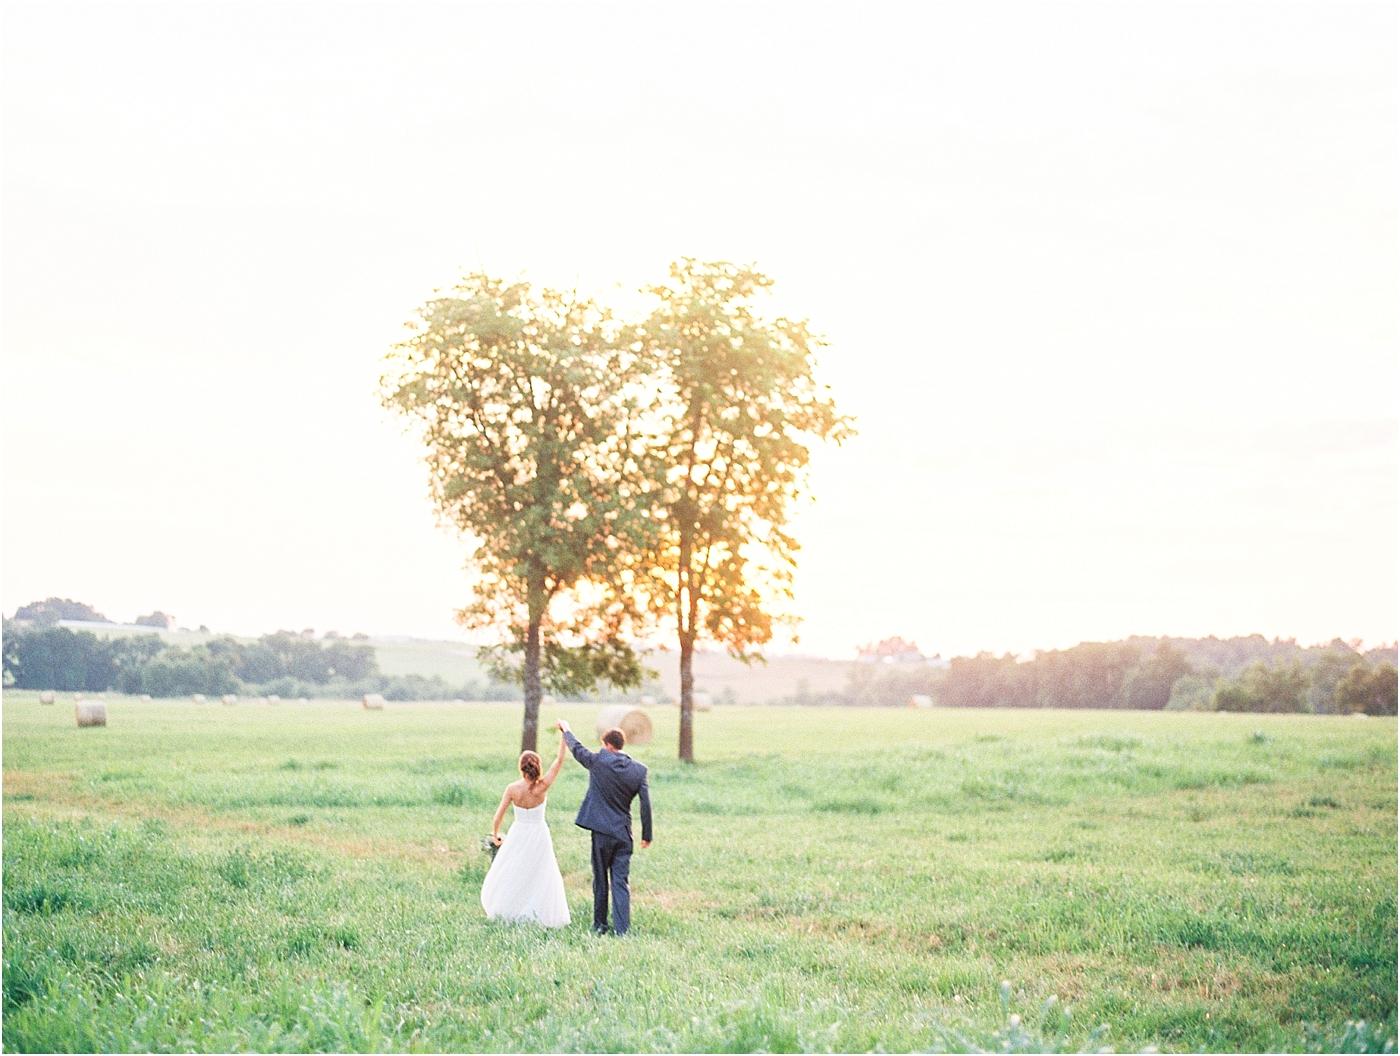 417 Wedding in Bolivar MO - Jordan Brittley Photography (jordanbrittley.com)